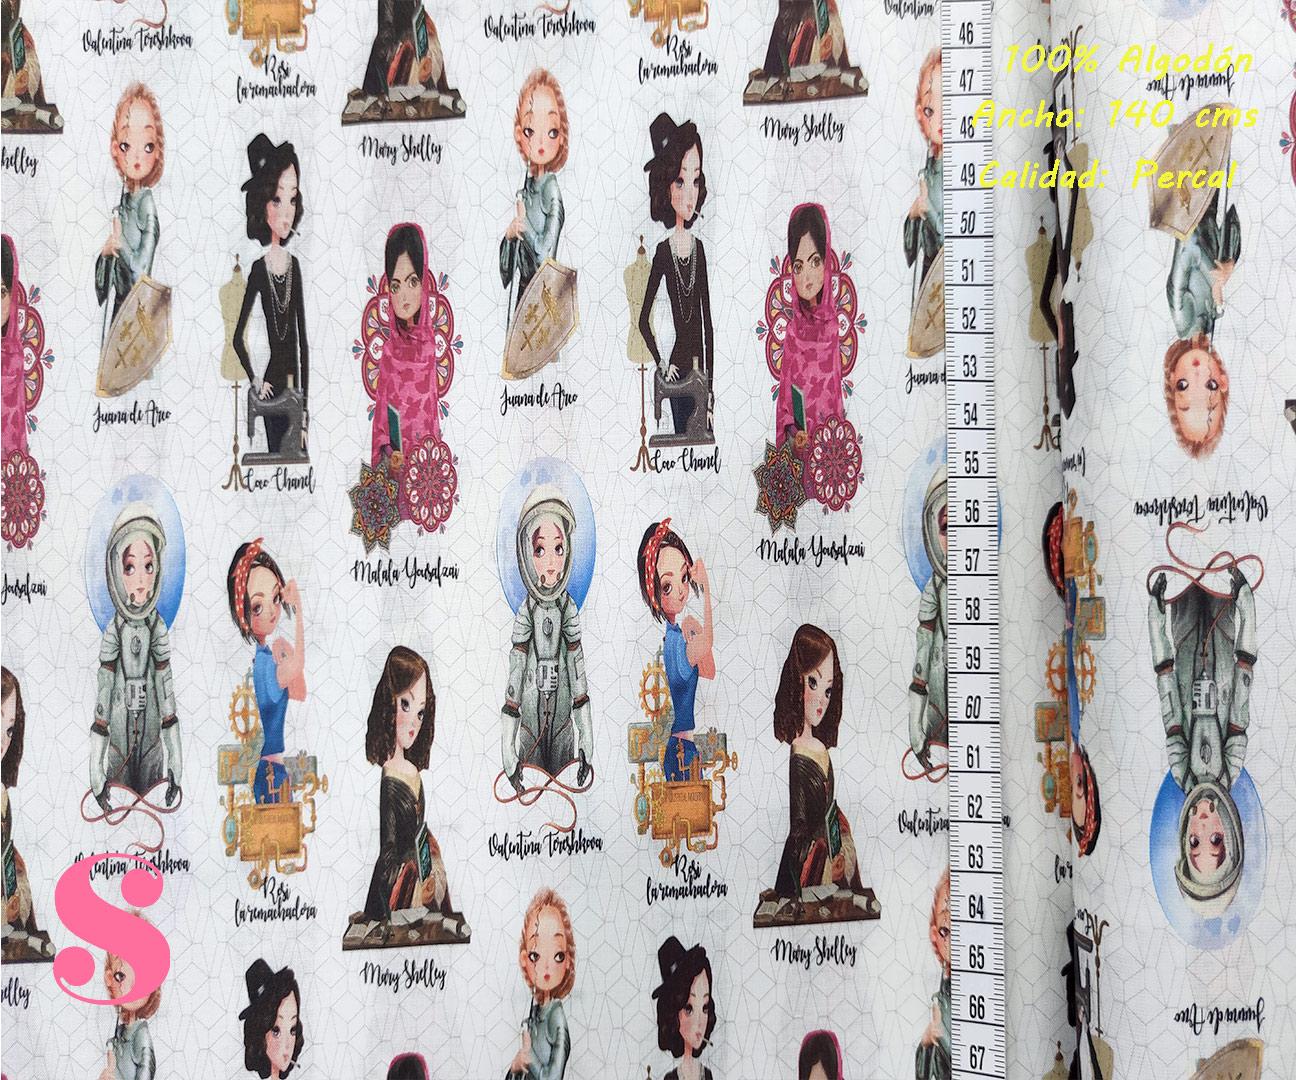 mujeres-historicas-leyendas-tejidos-algodón-estampado-percal,Tejido Estampado Mujeres Históricas